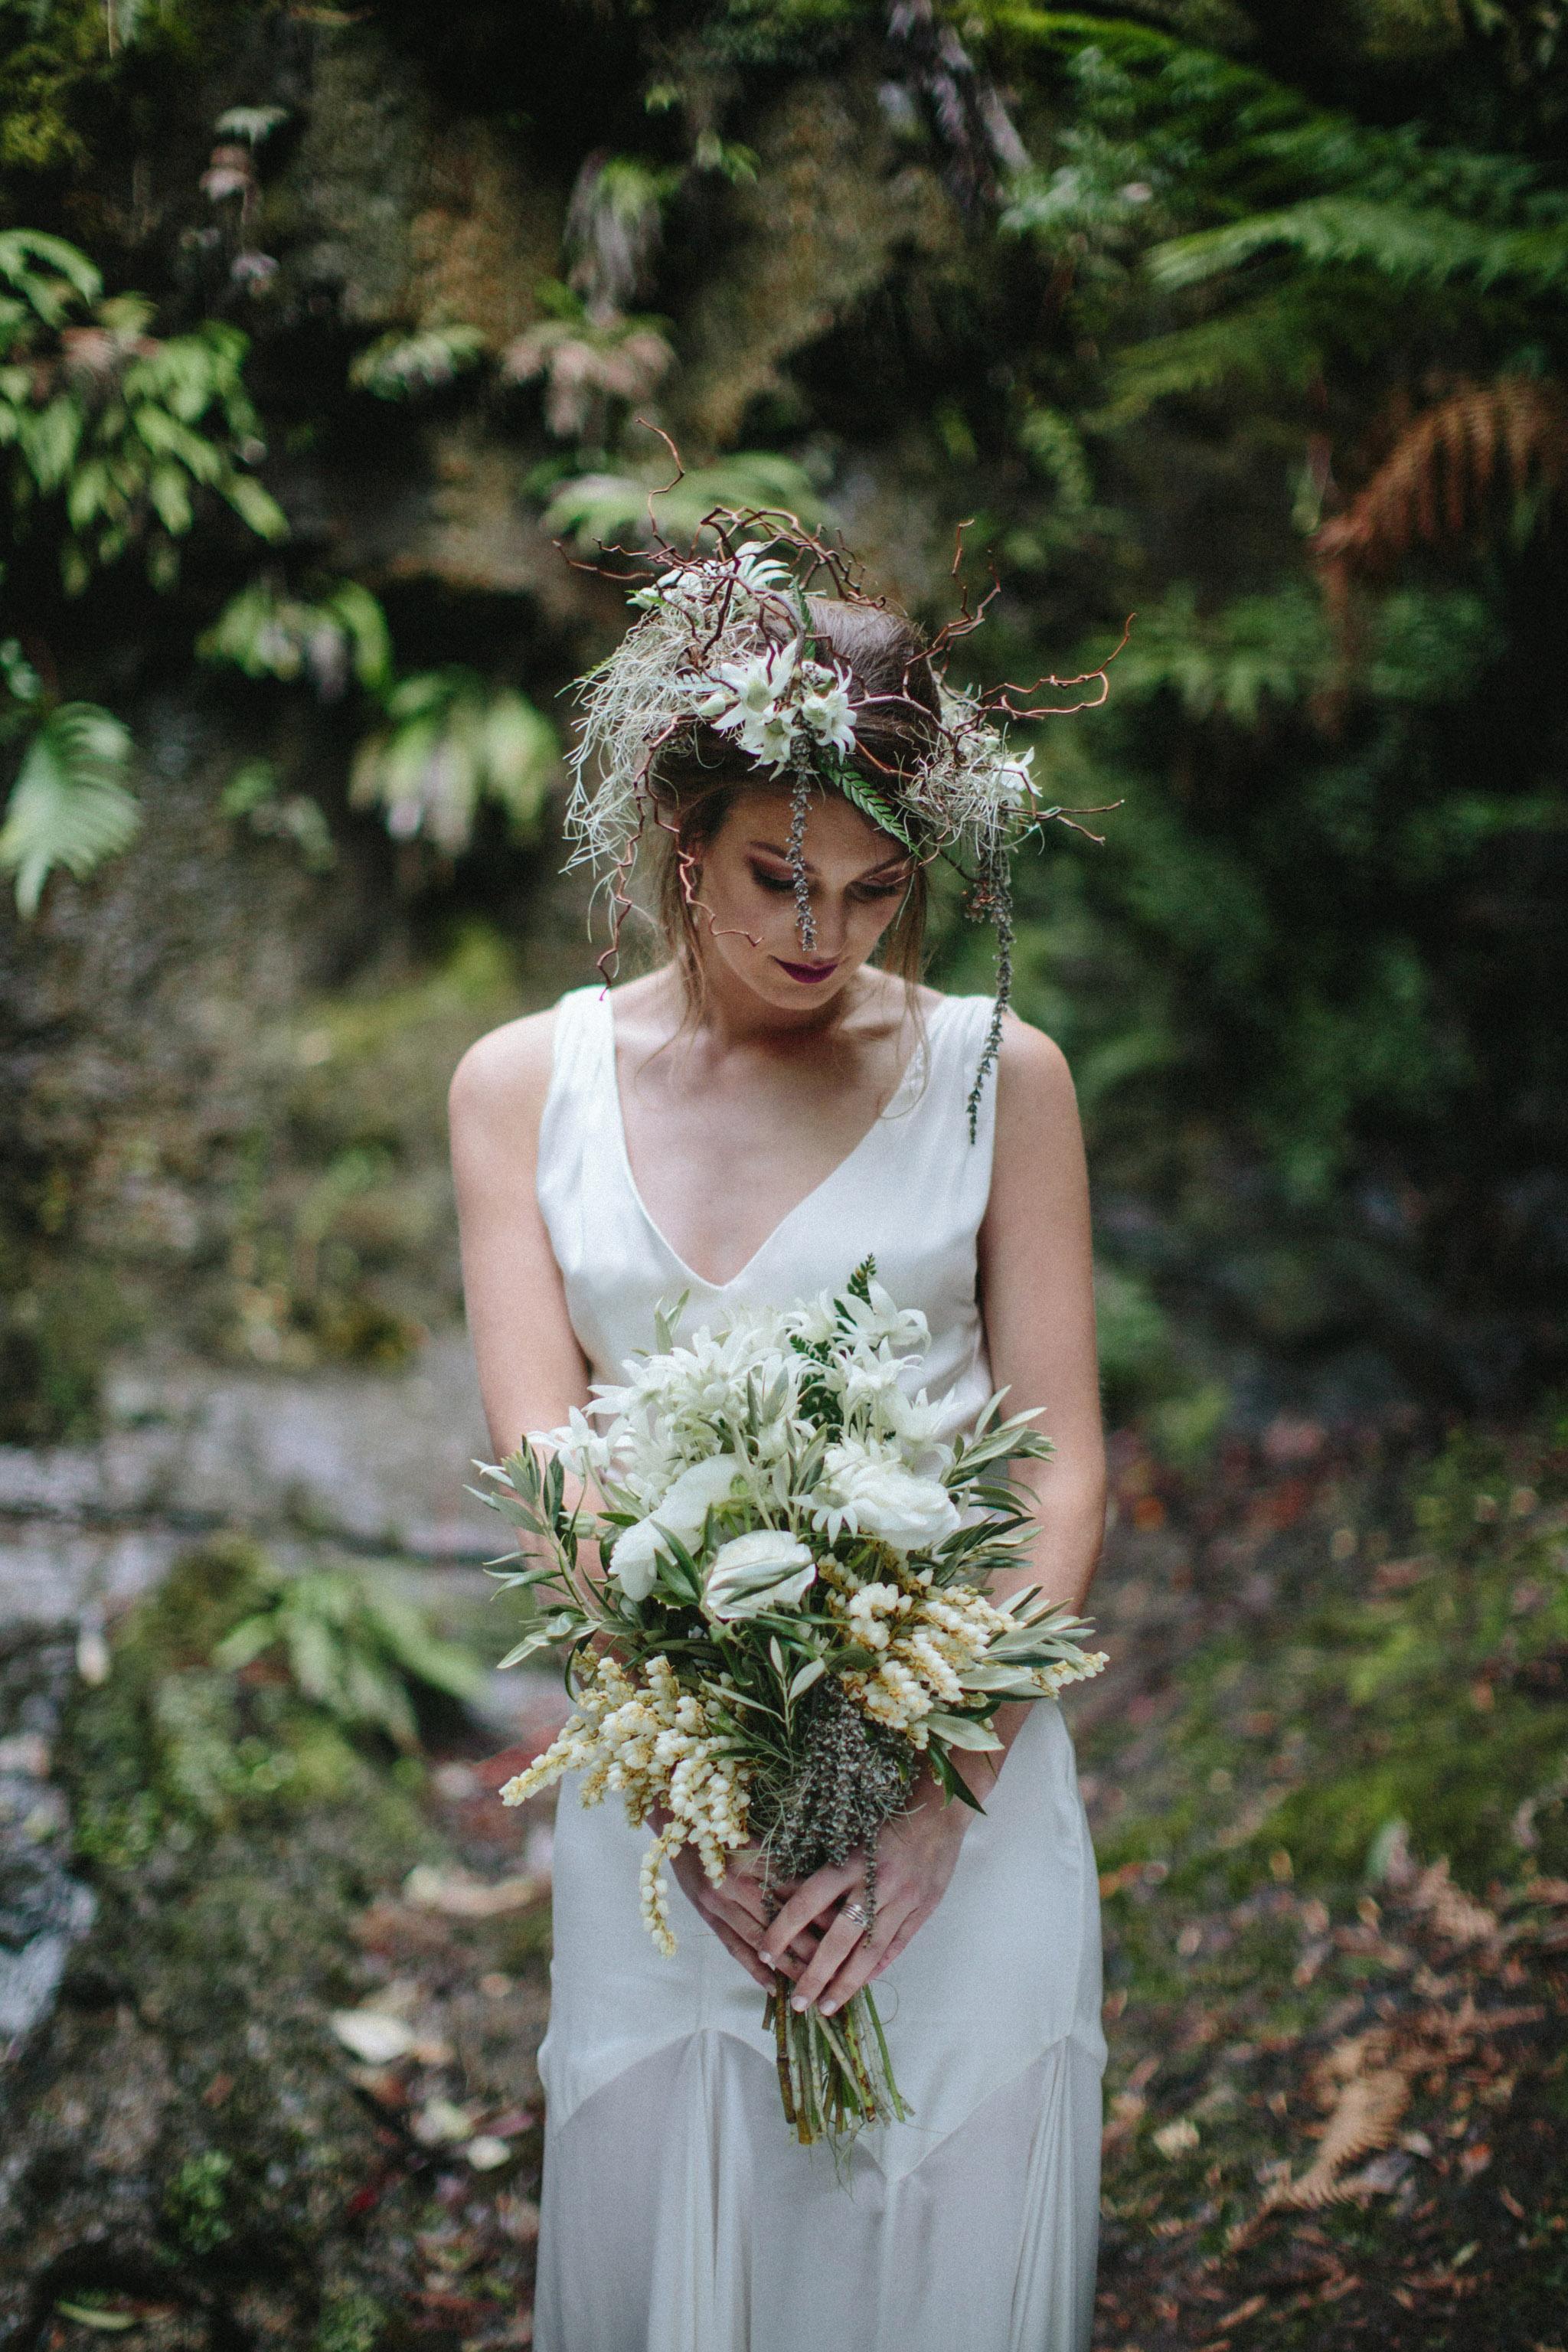 Wedding Photography Websites Inspiration: Dark & Woodsy Bridal Inspiration